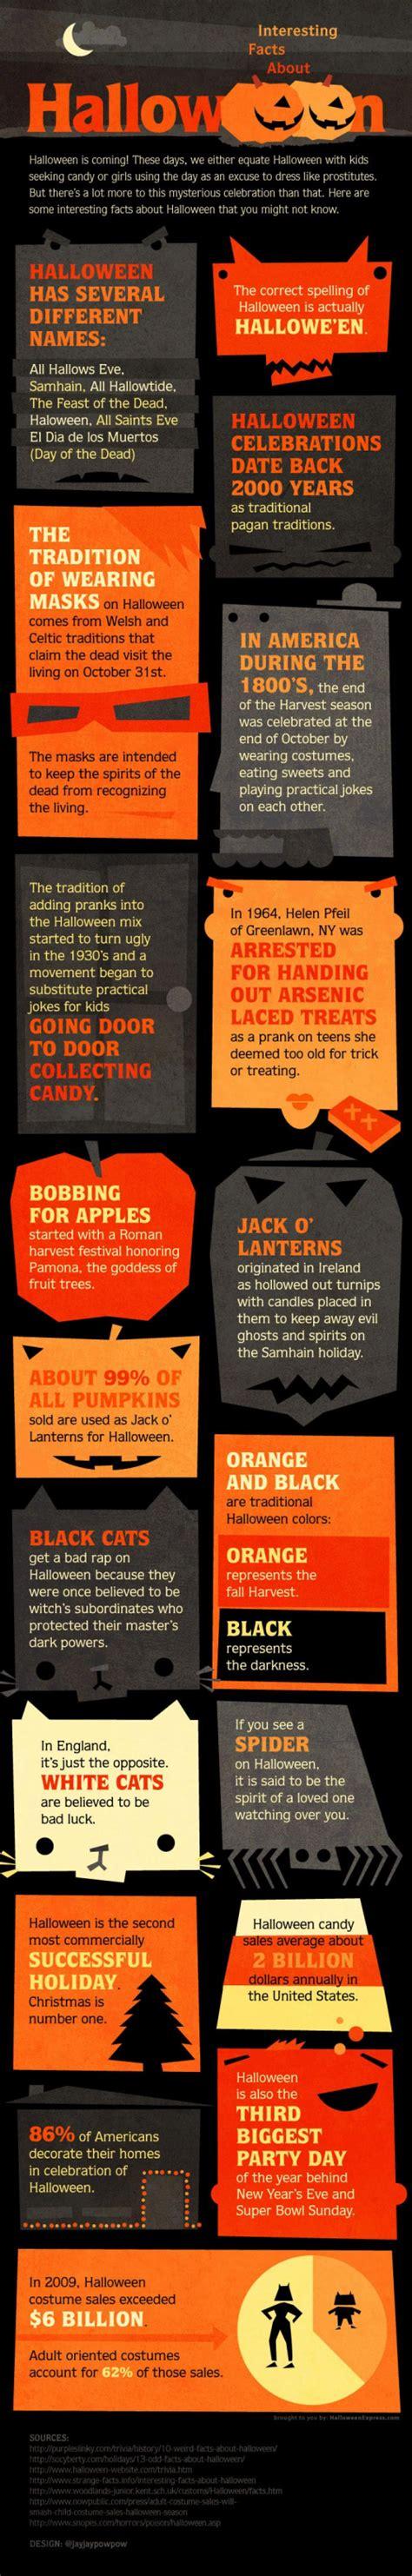 halloween facts kidspressmagazine com